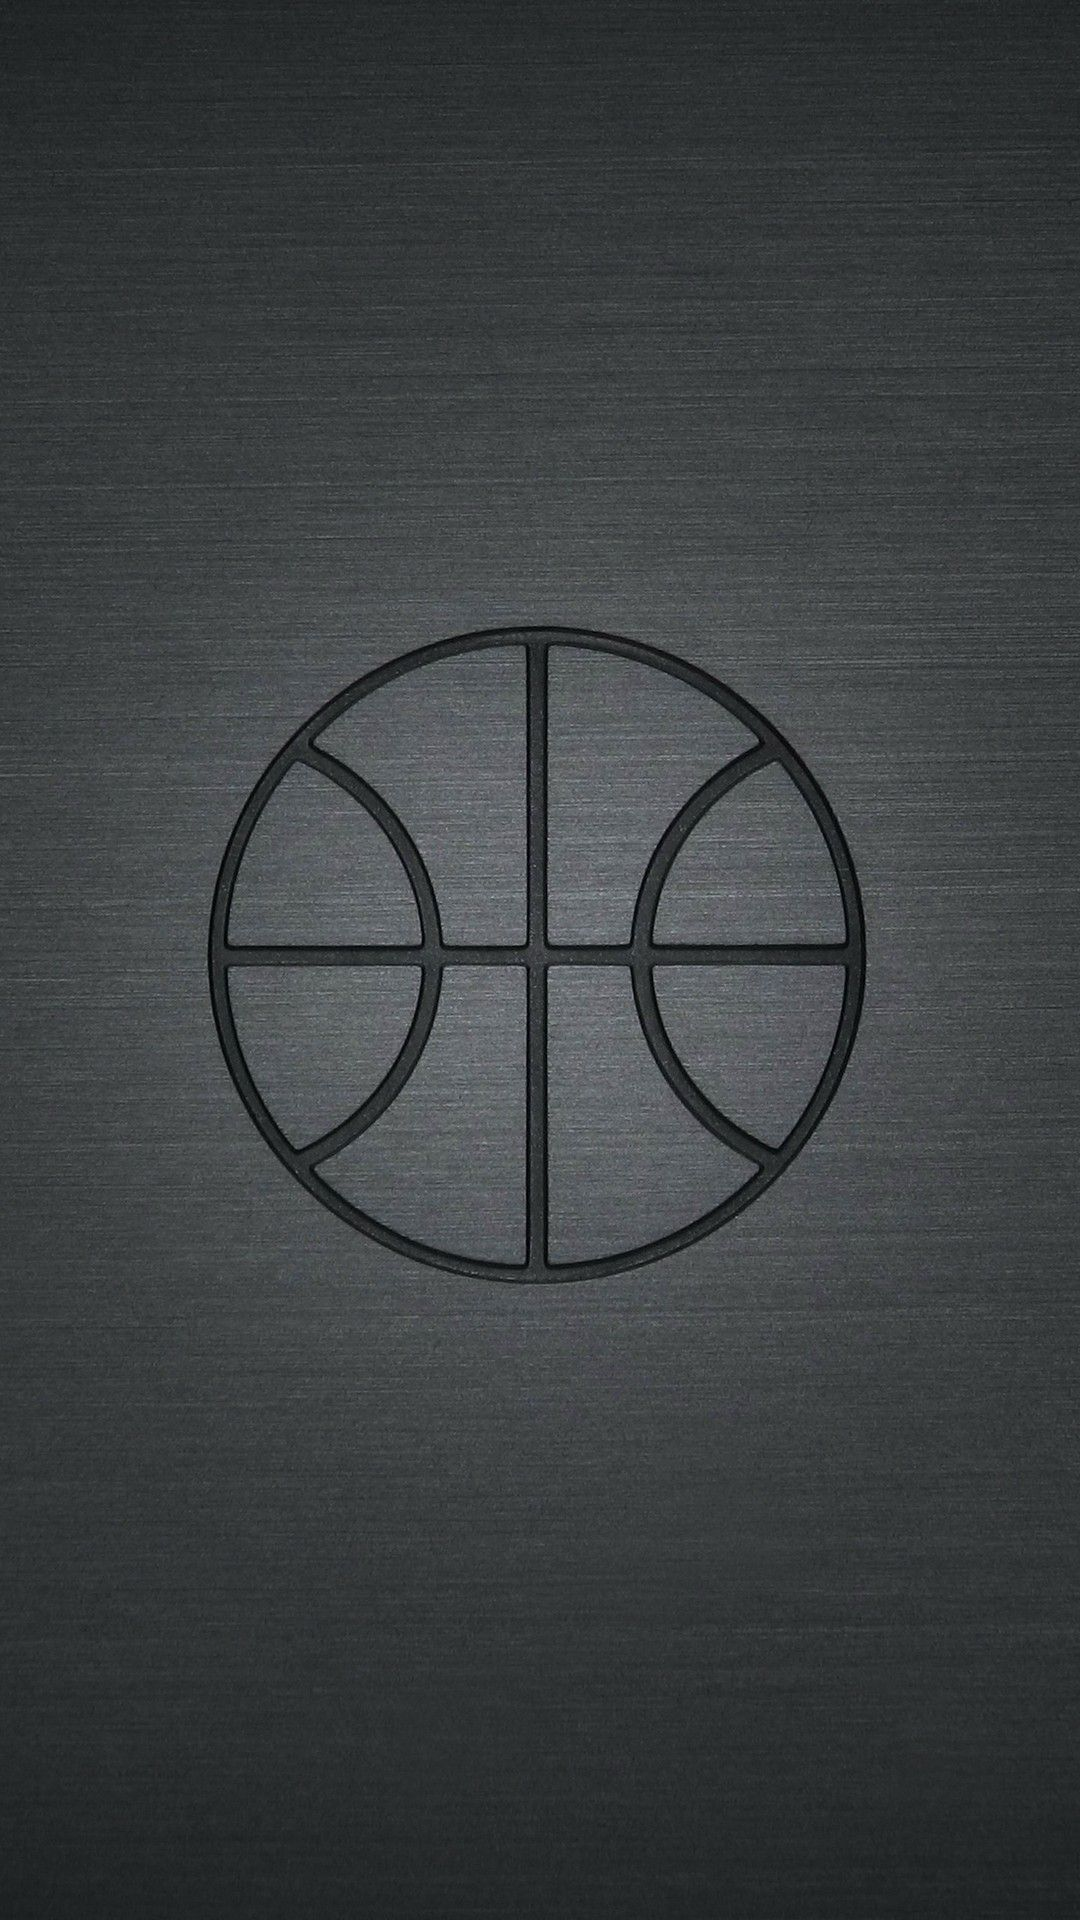 Nba Basketball Iphone 7 Wallpaper In 2020 Nba Wallpapers Basketball Wallpaper Basketball Iphone Wallpaper